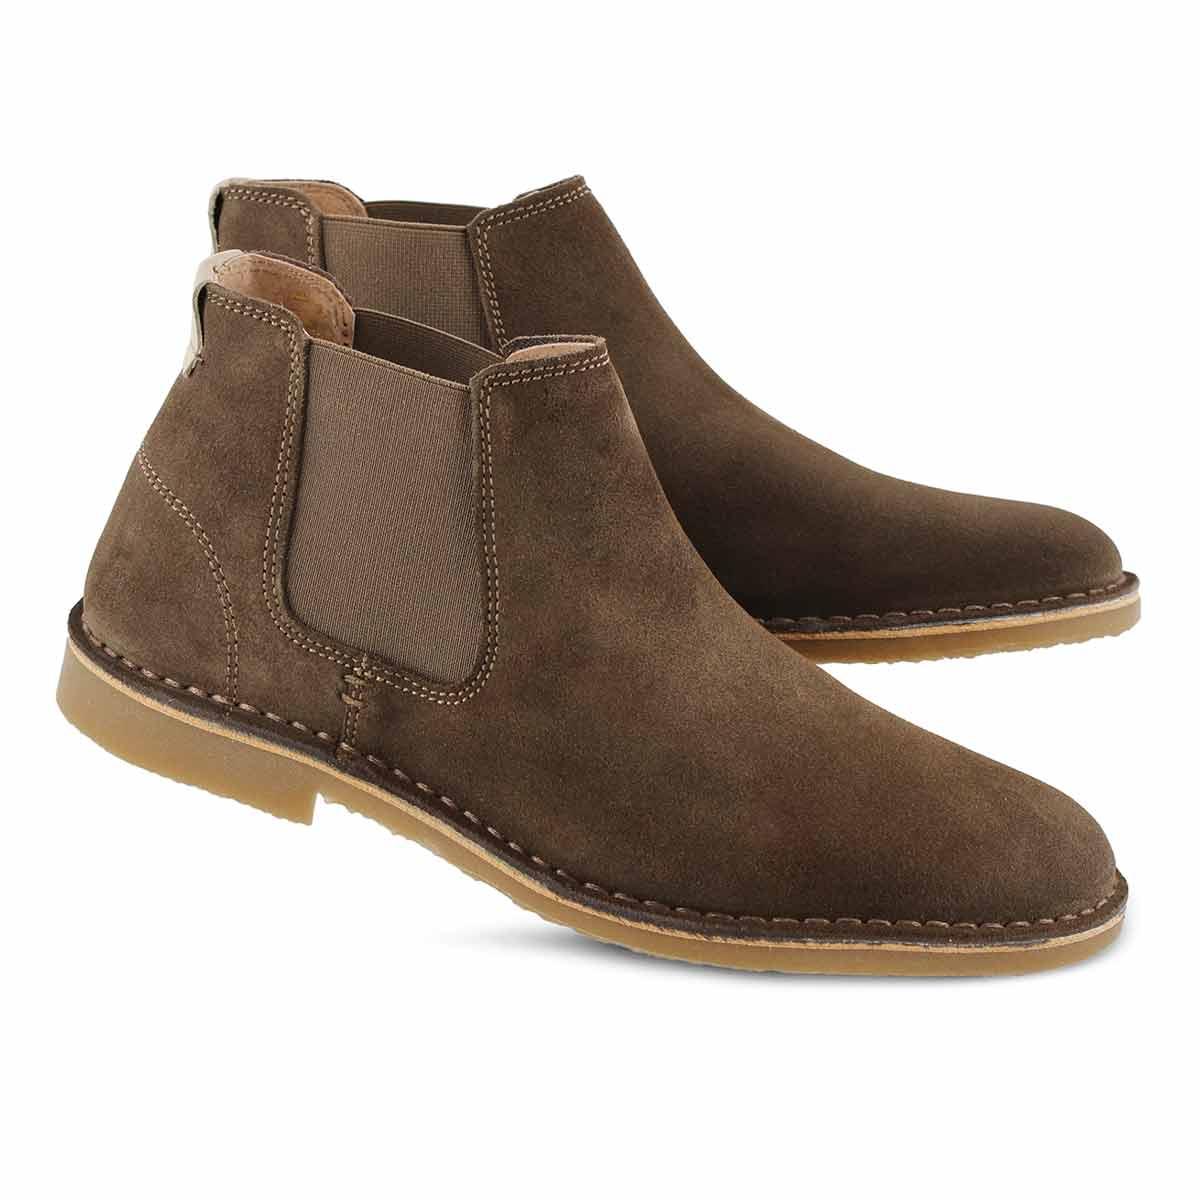 Mns Cob brown chelsea boot